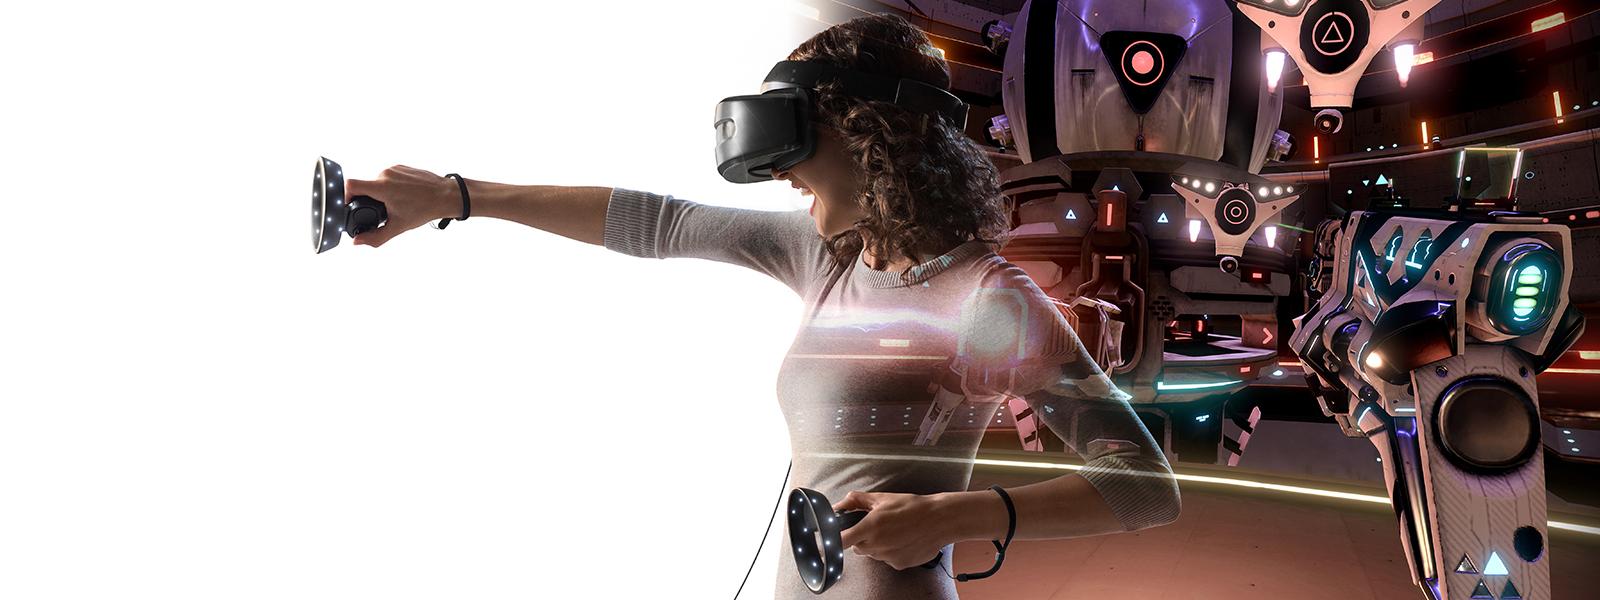 Windows Mixed Reality デバイスを使用して Space Pirate Trainer で遊んでいる女性